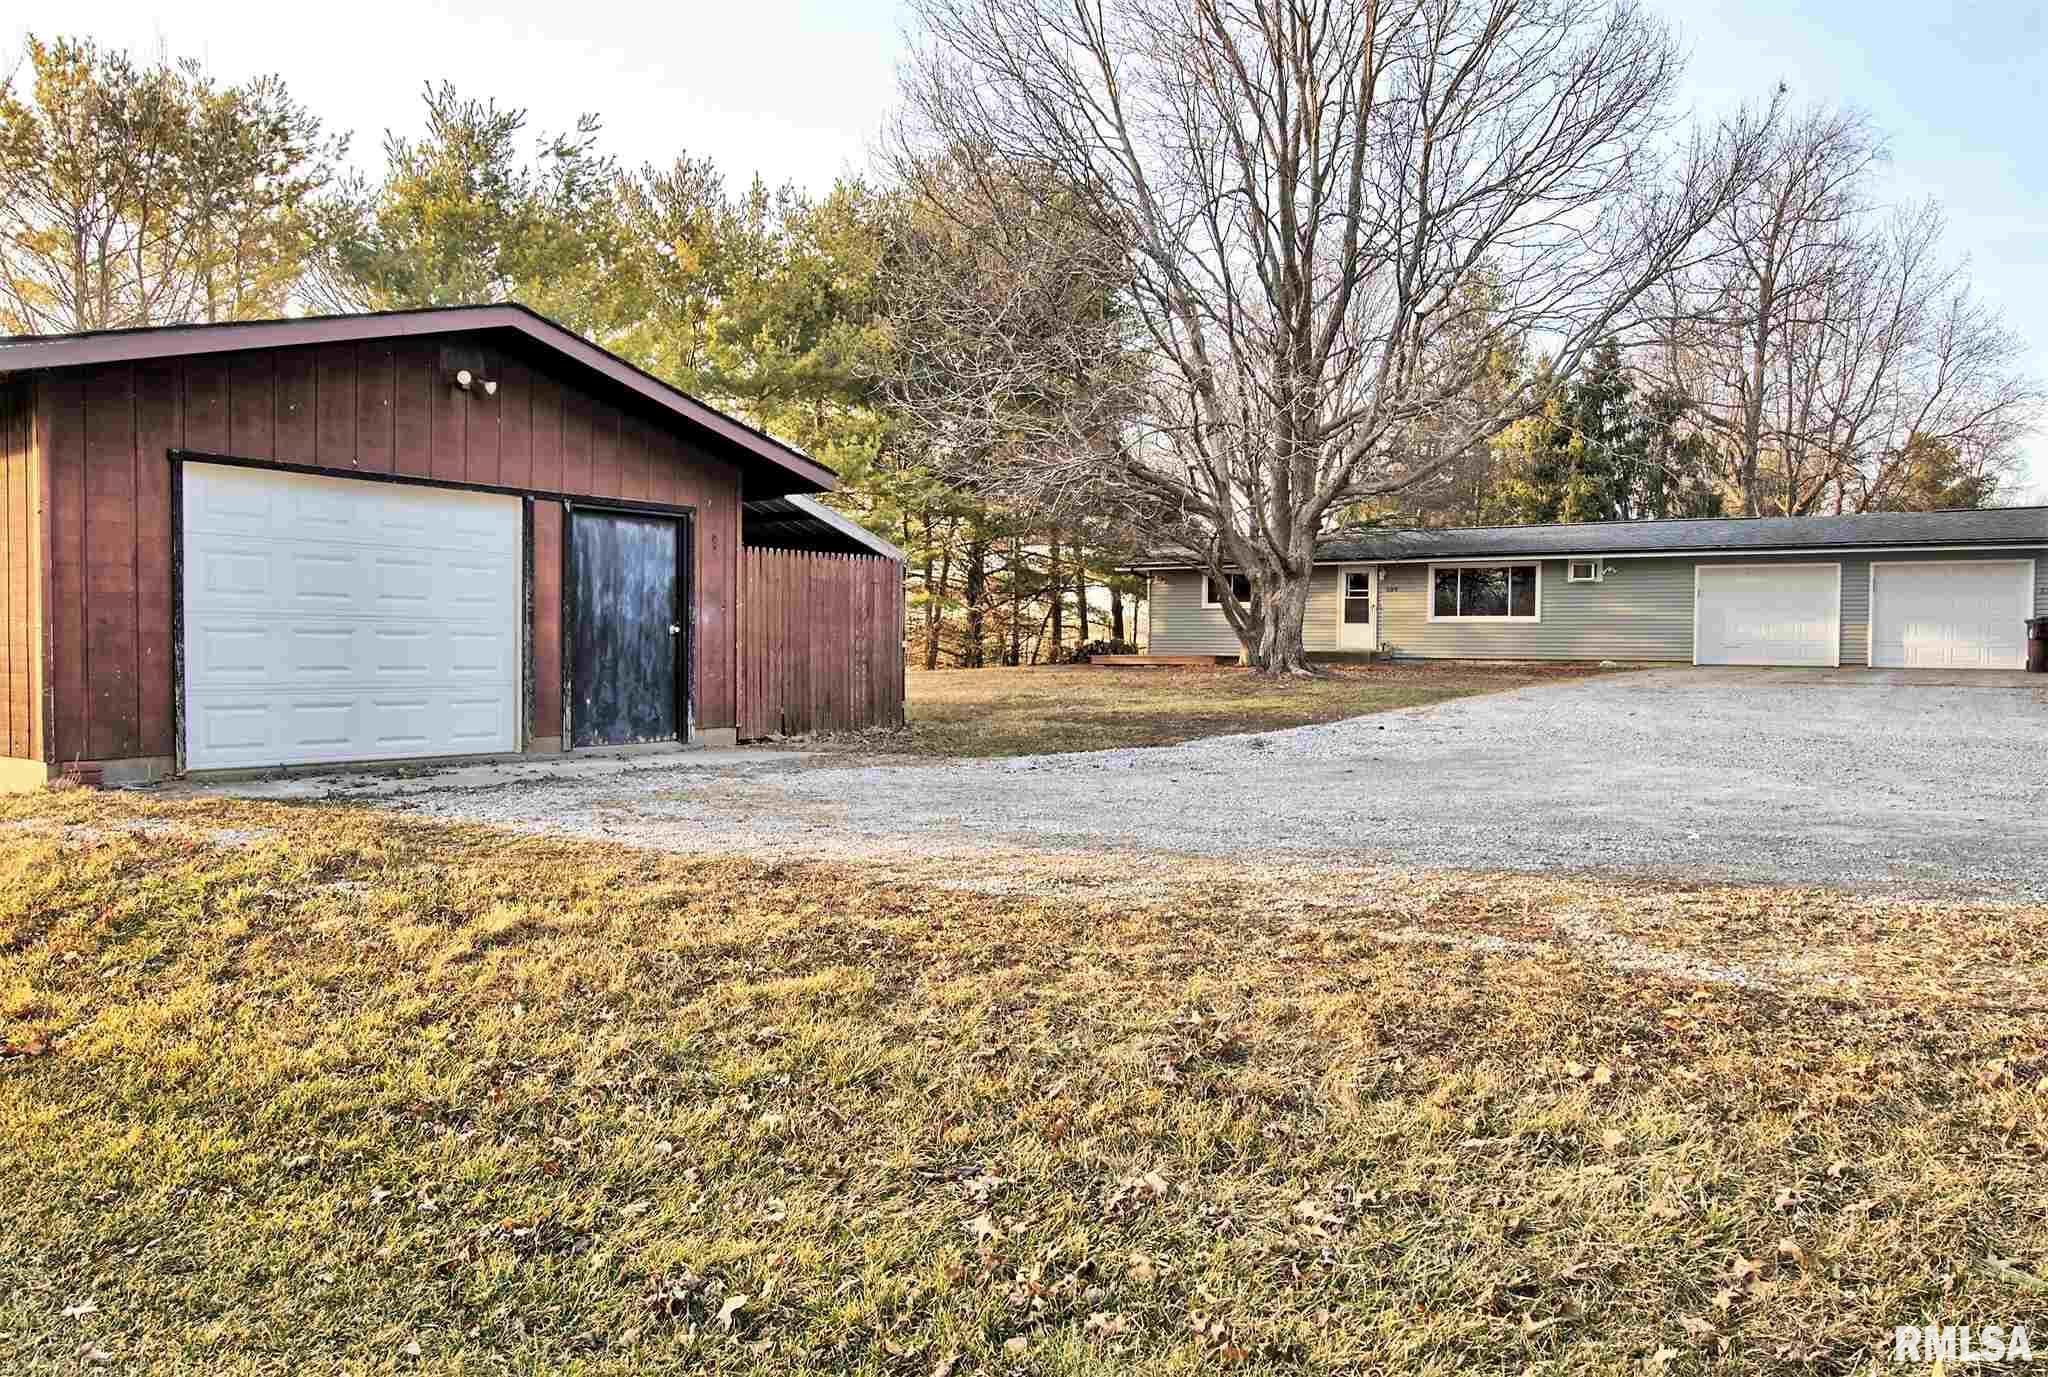 509-511 N SANTA FE Property Photo - Princeville, IL real estate listing